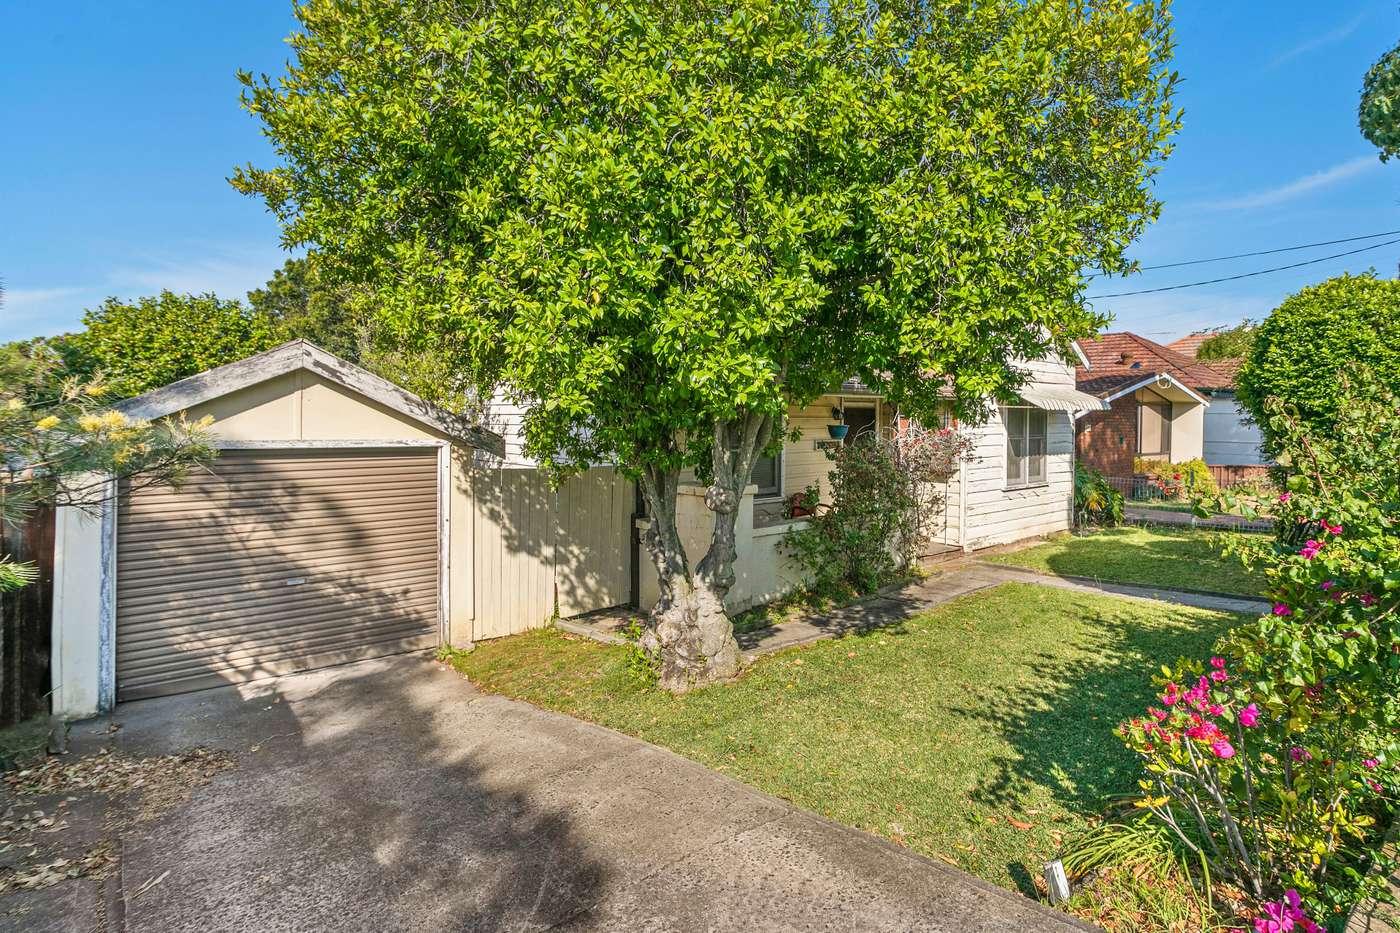 Main view of Homely house listing, 242 Patrick Street, Hurstville, NSW 2220